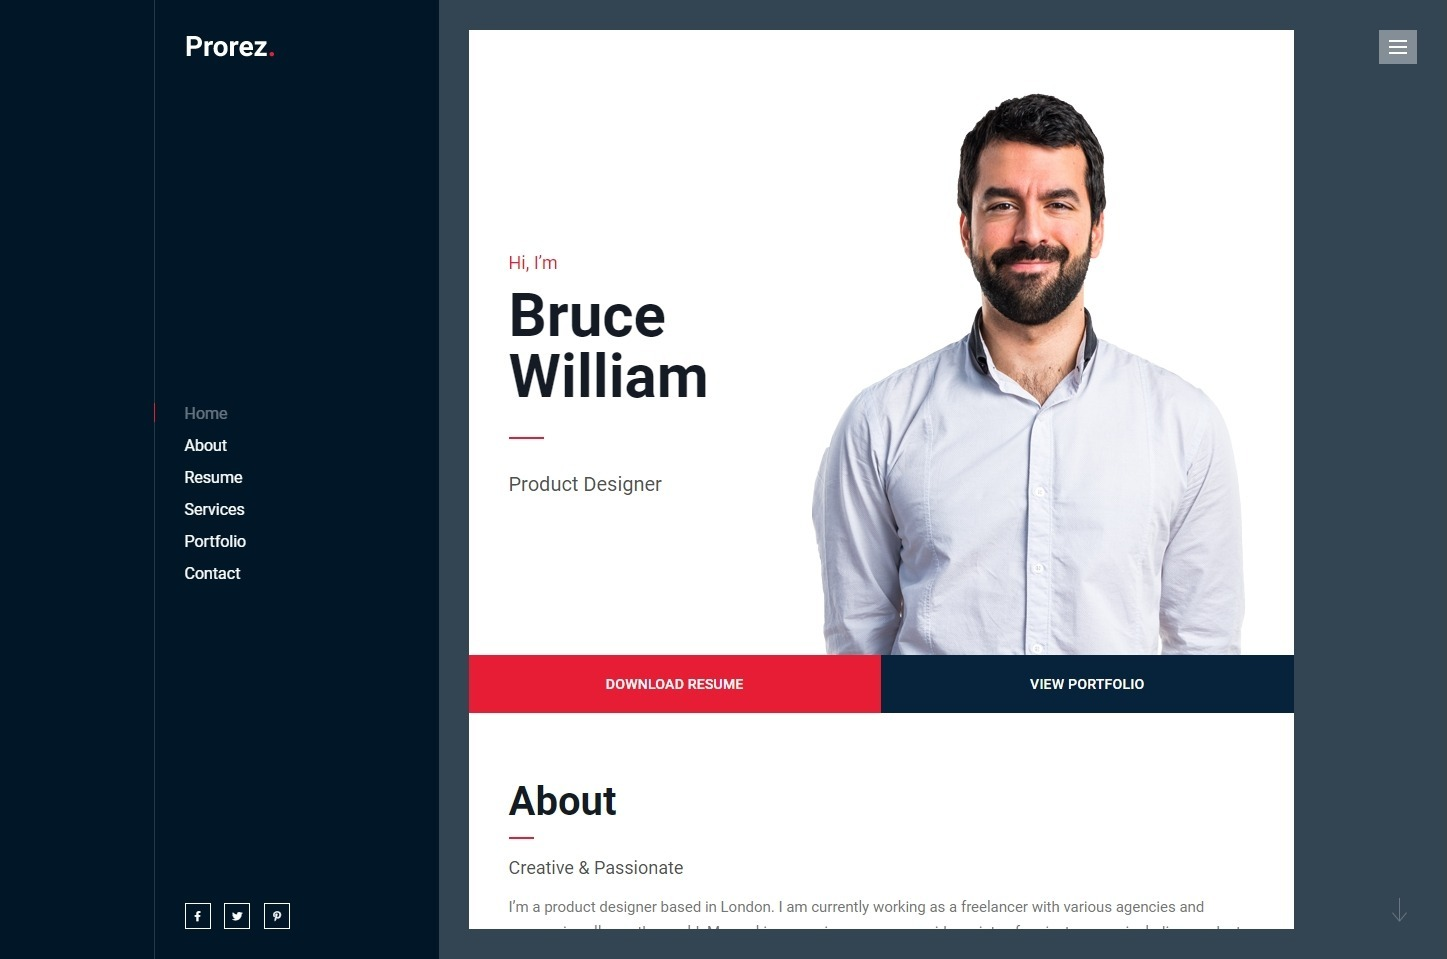 ProRez Professional Digital Resume WordPress Theme